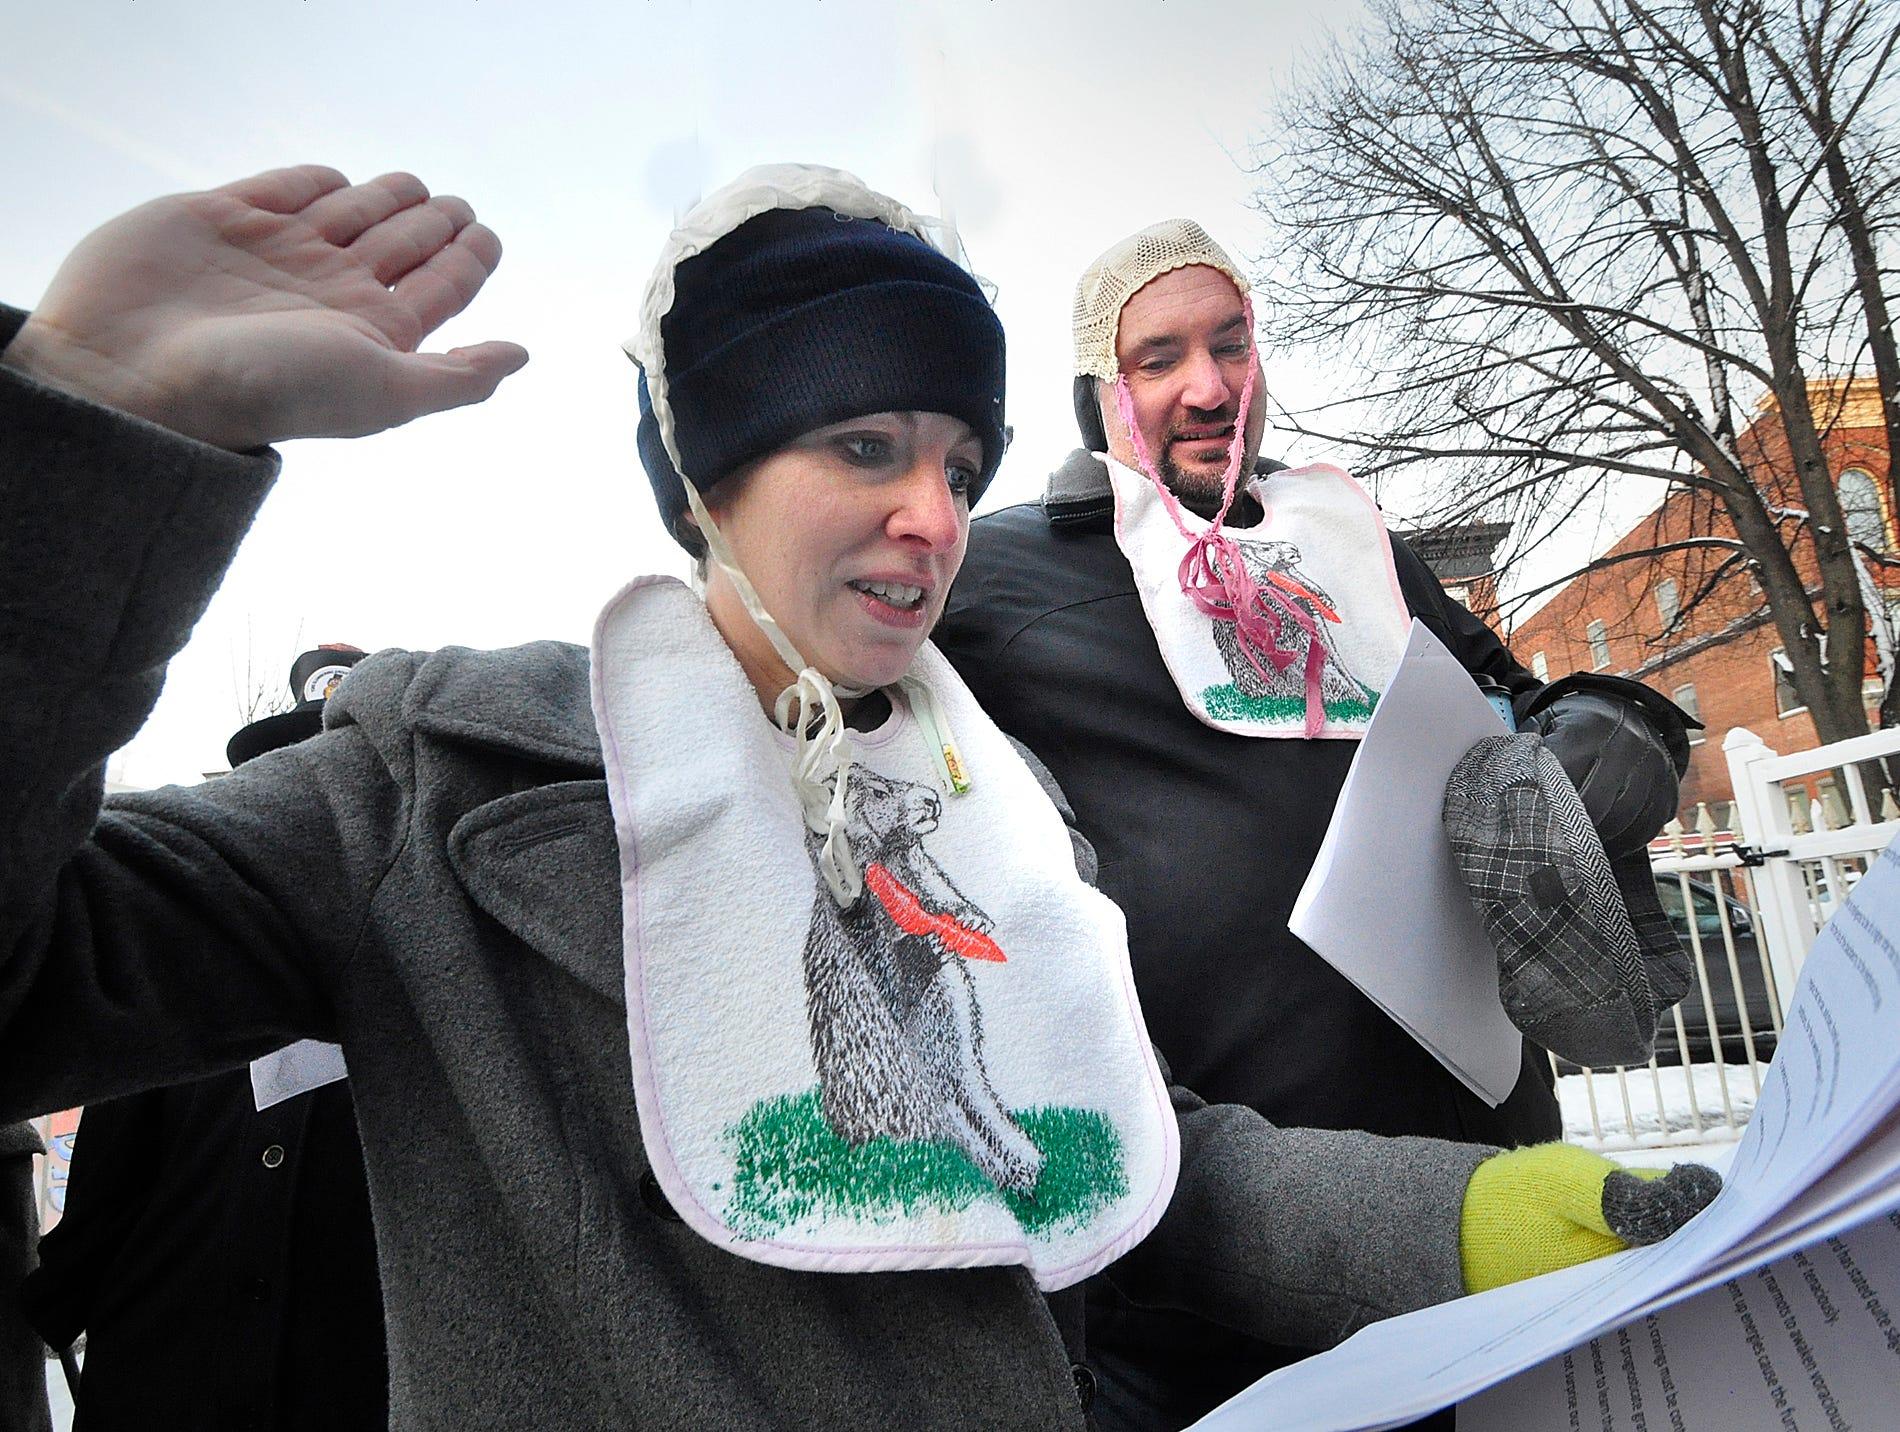 Laura Jensen of York city and Charlie Jansen of York Township read the Groundhog pledge during festivities Saturday.  Bil Bowden photo.